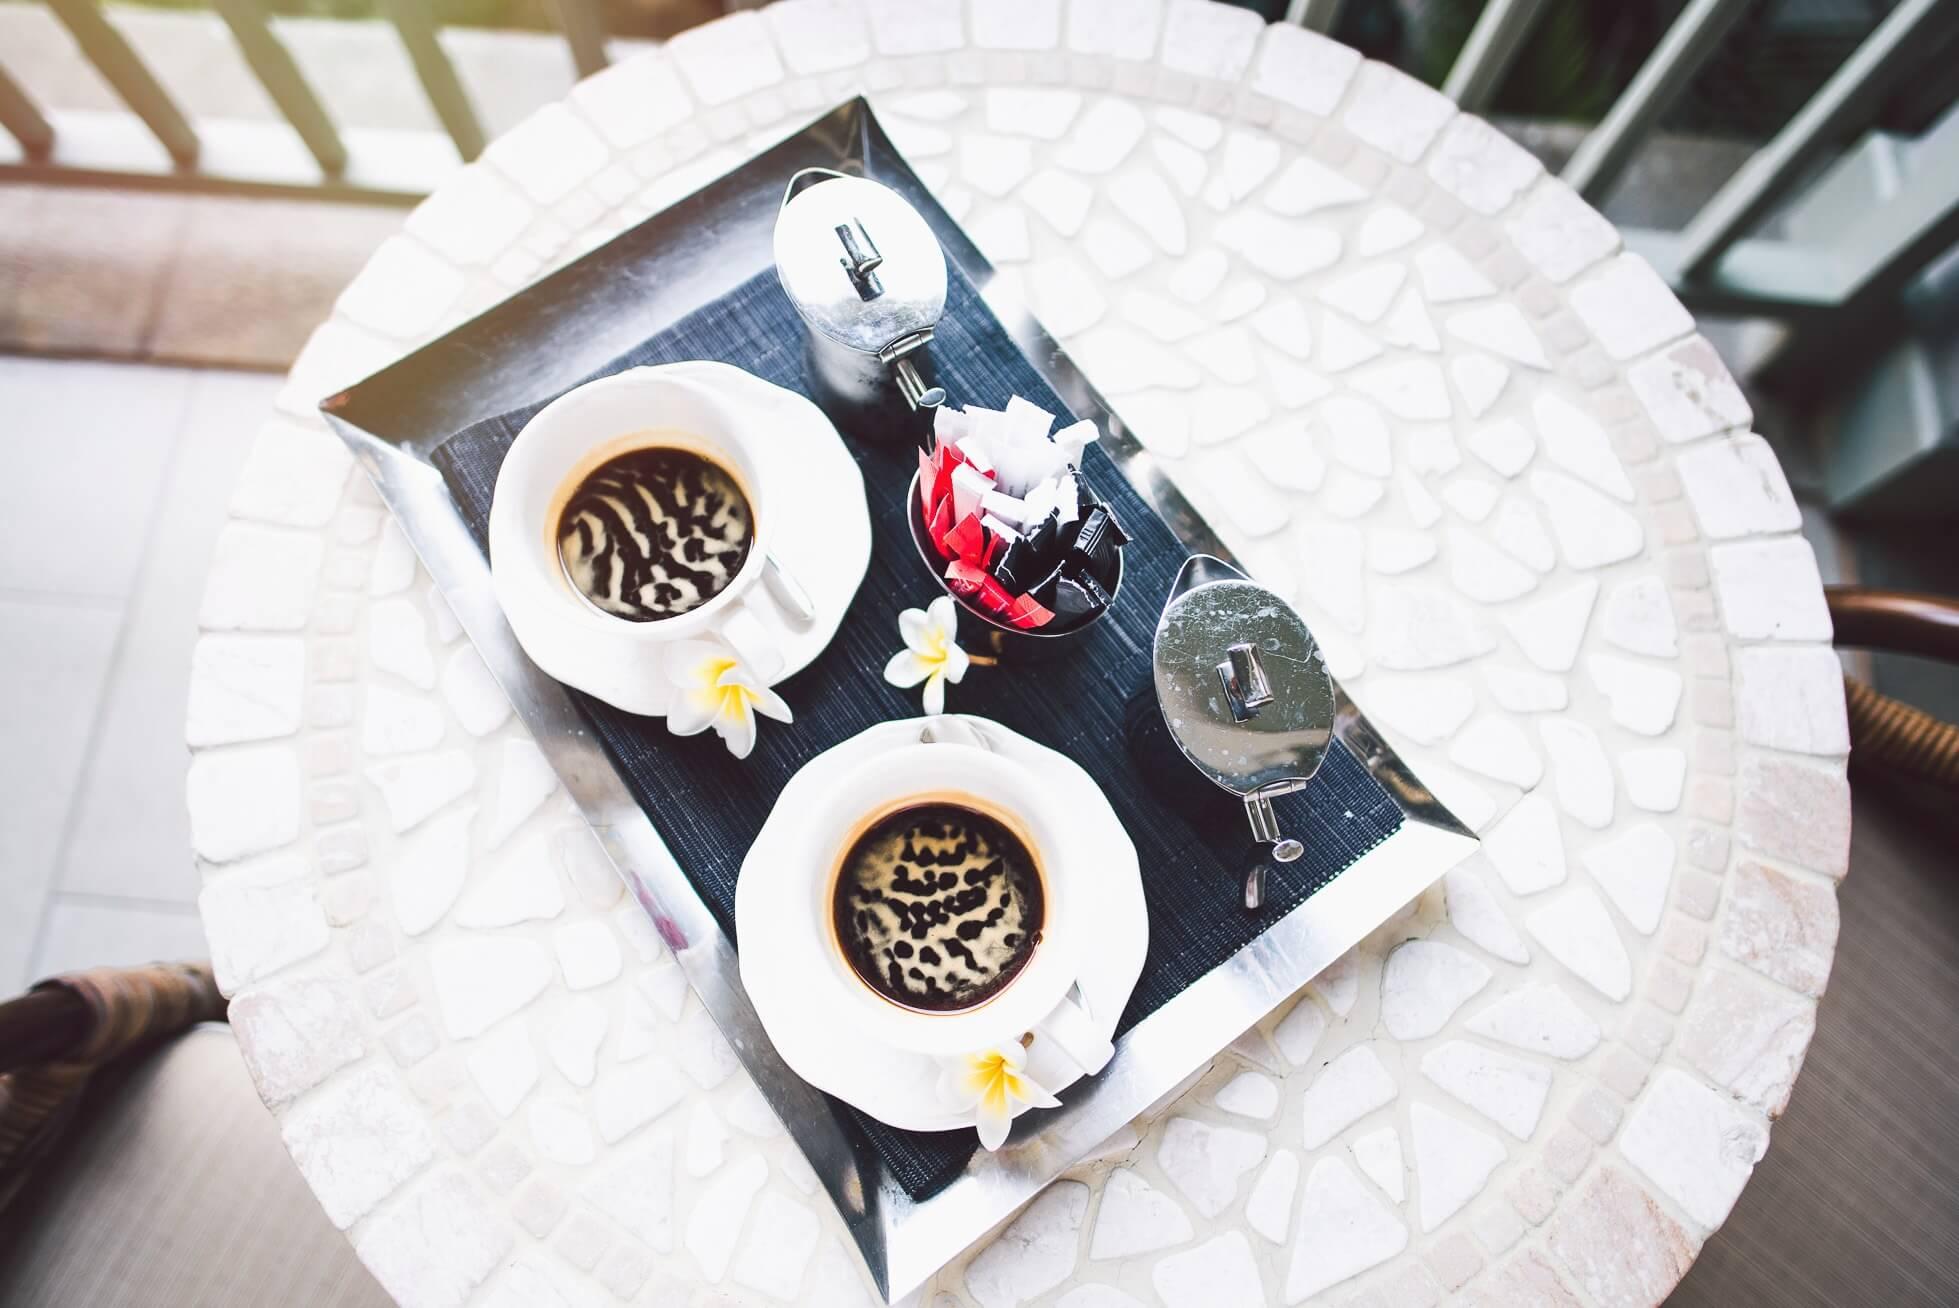 janni-deler-morning-coffeeDSC_3899janni